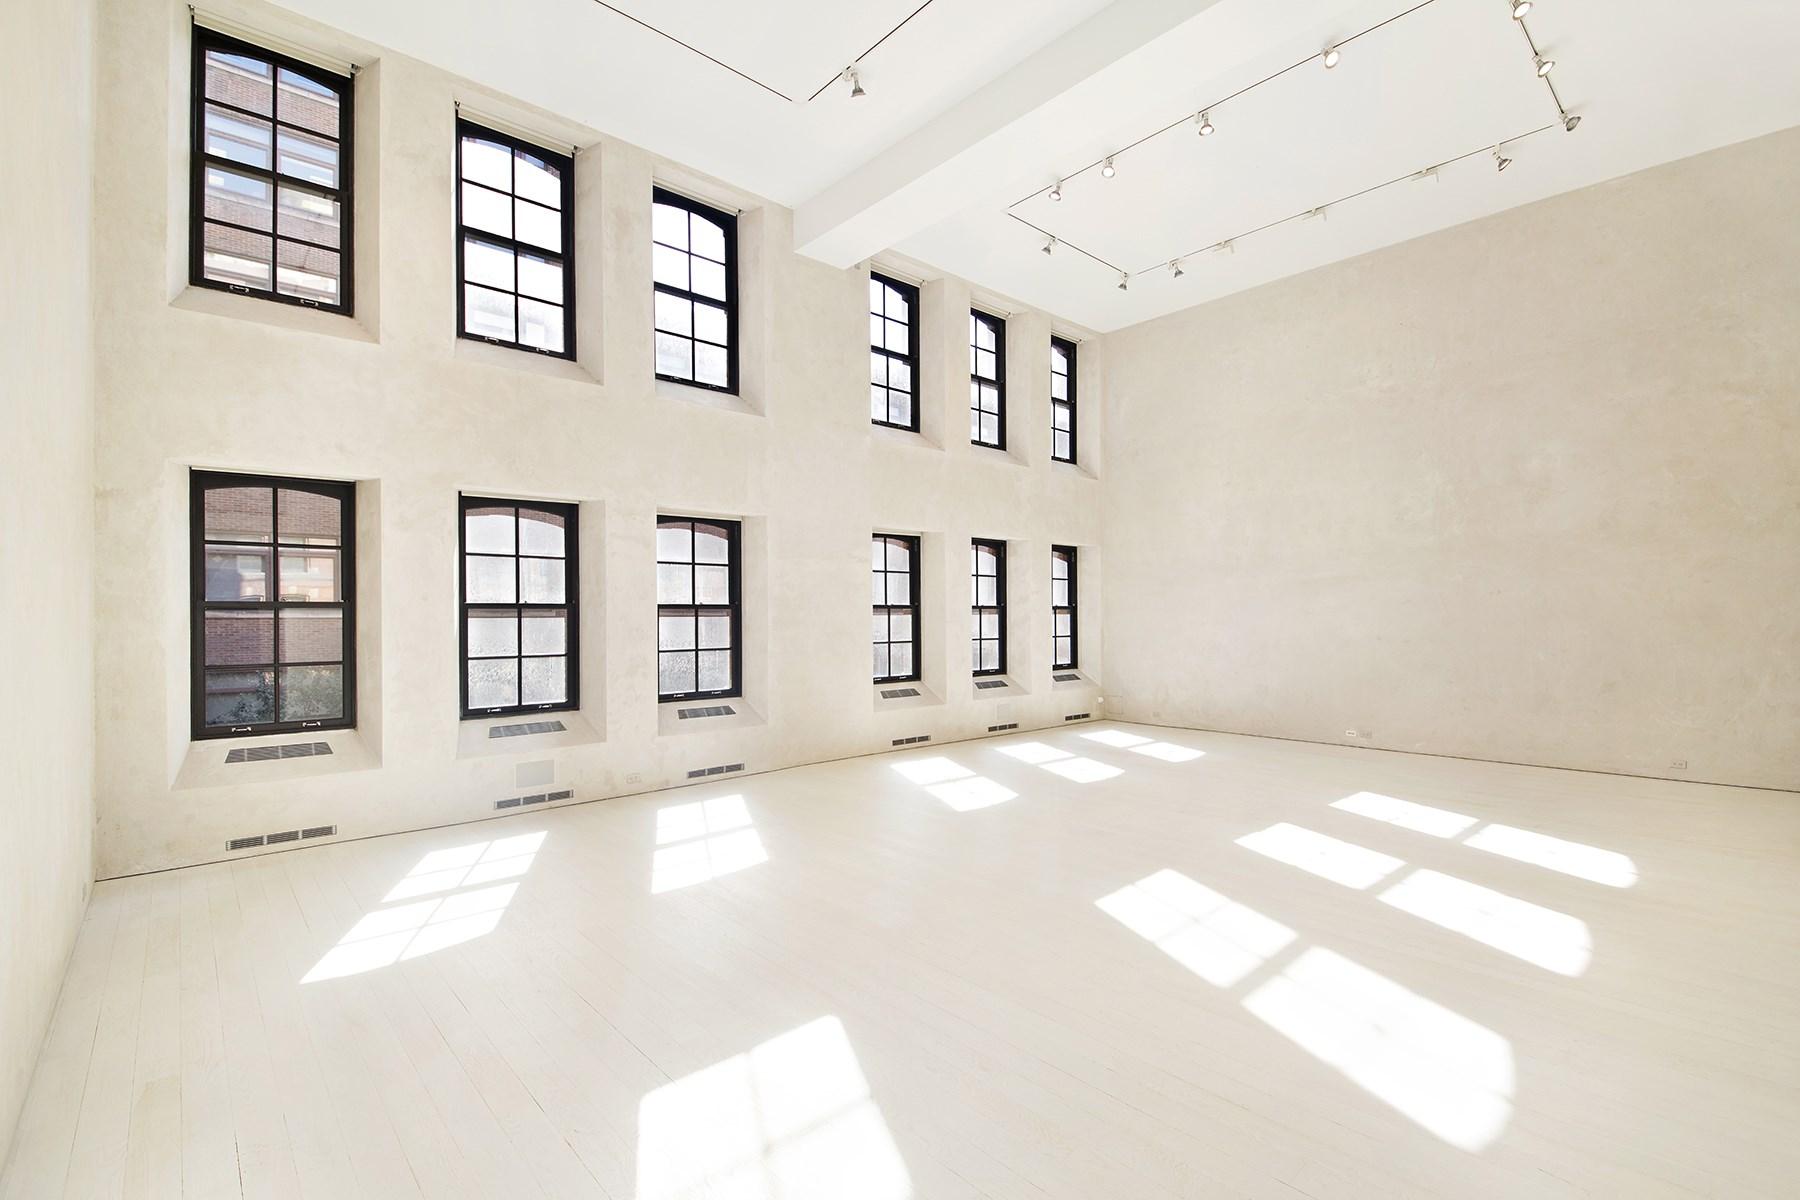 Nhà chung cư vì Bán tại 43 Clarkson Street 43 Clarkson Street Apt 234A West Village, New York, New York, 10014 Hoa Kỳ